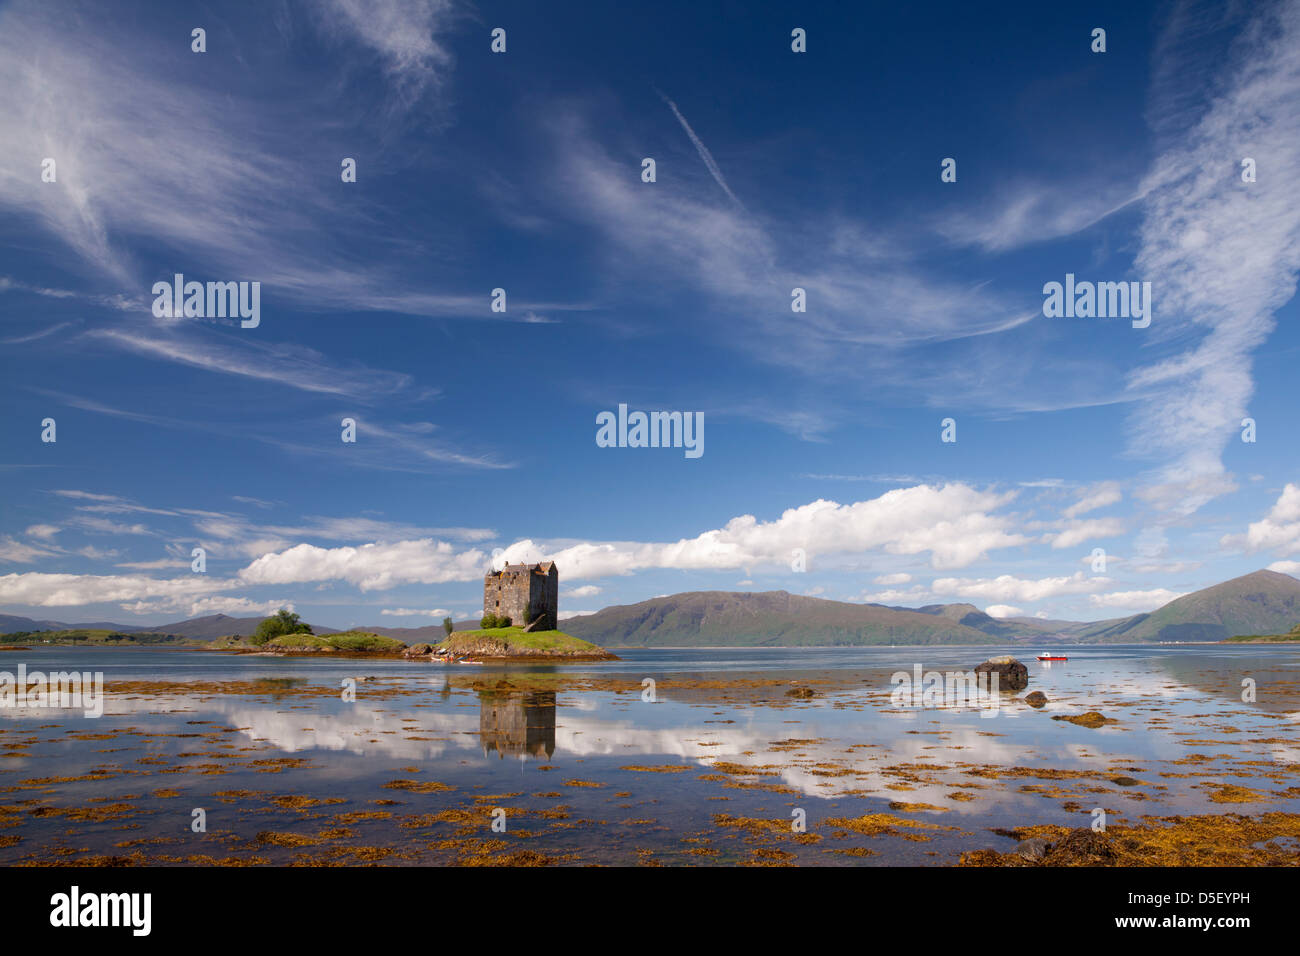 Castle of Stalker near Appin village - An Apainn -, Highlands, Scotland - Stock Image